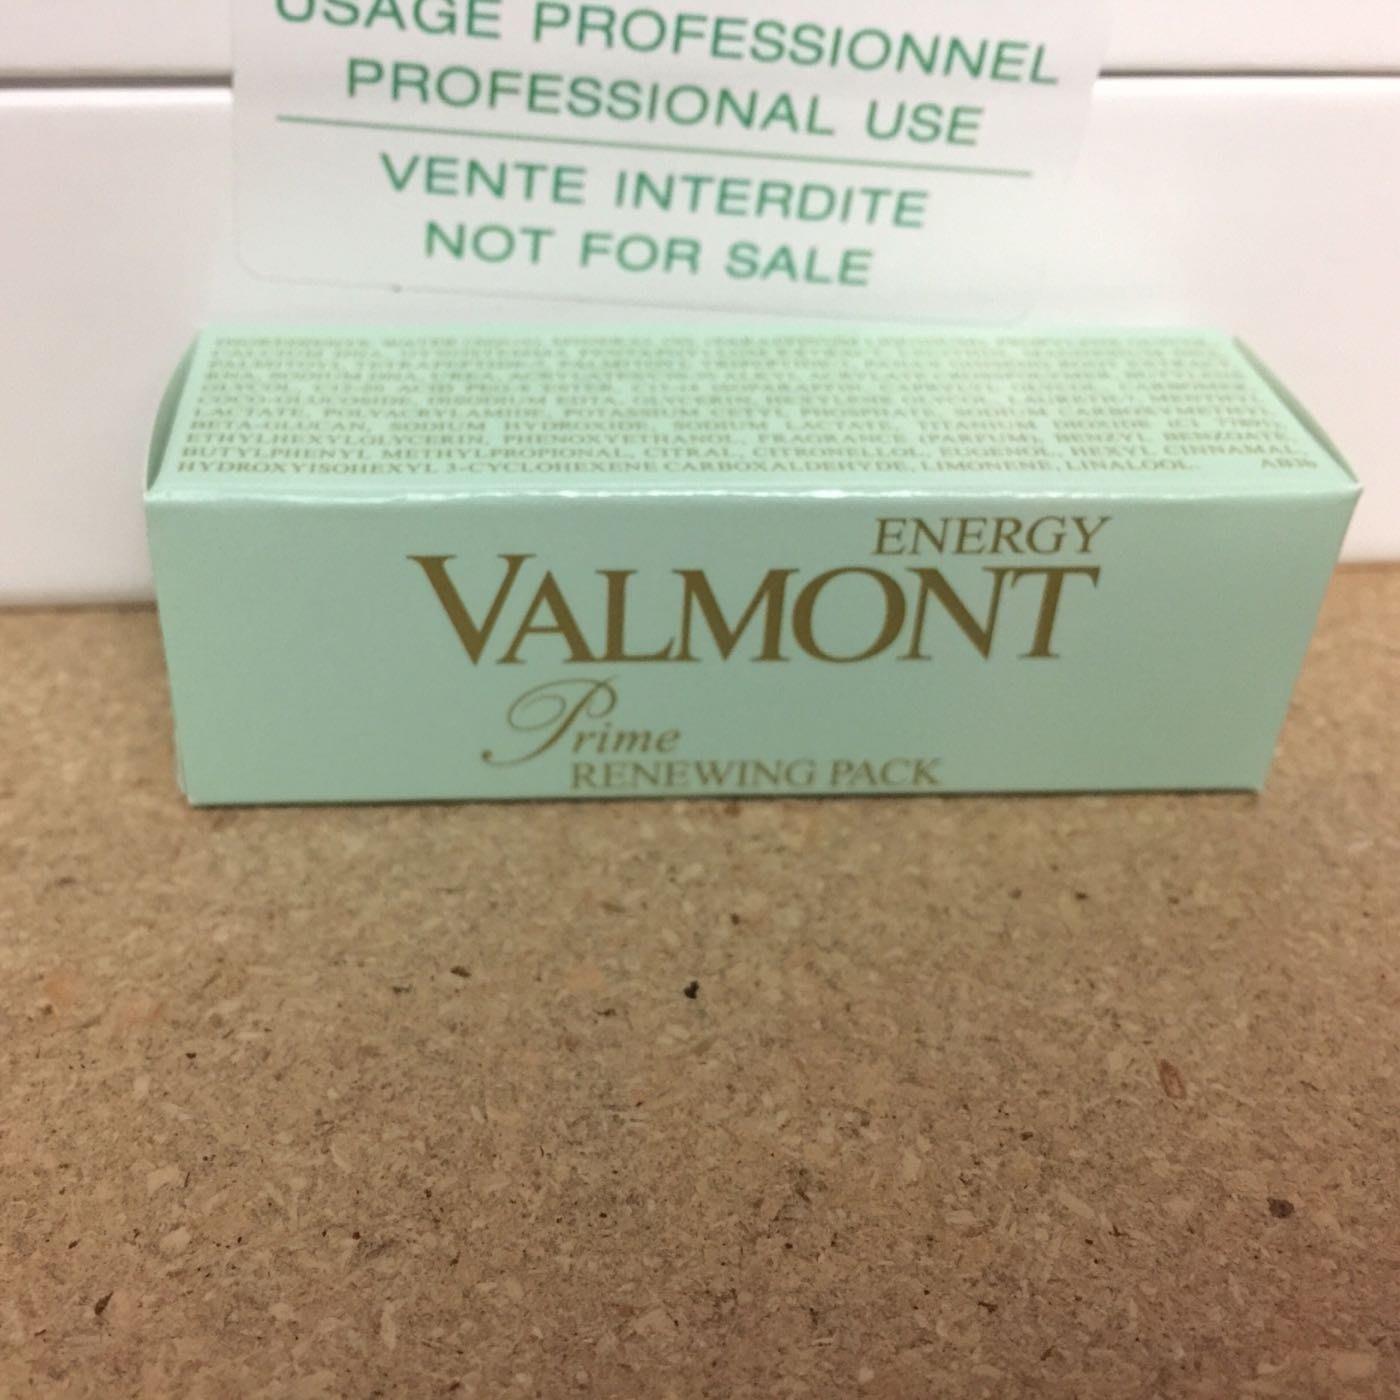 本週特惠Valmont 更新面膜prime renewing pack 5ml